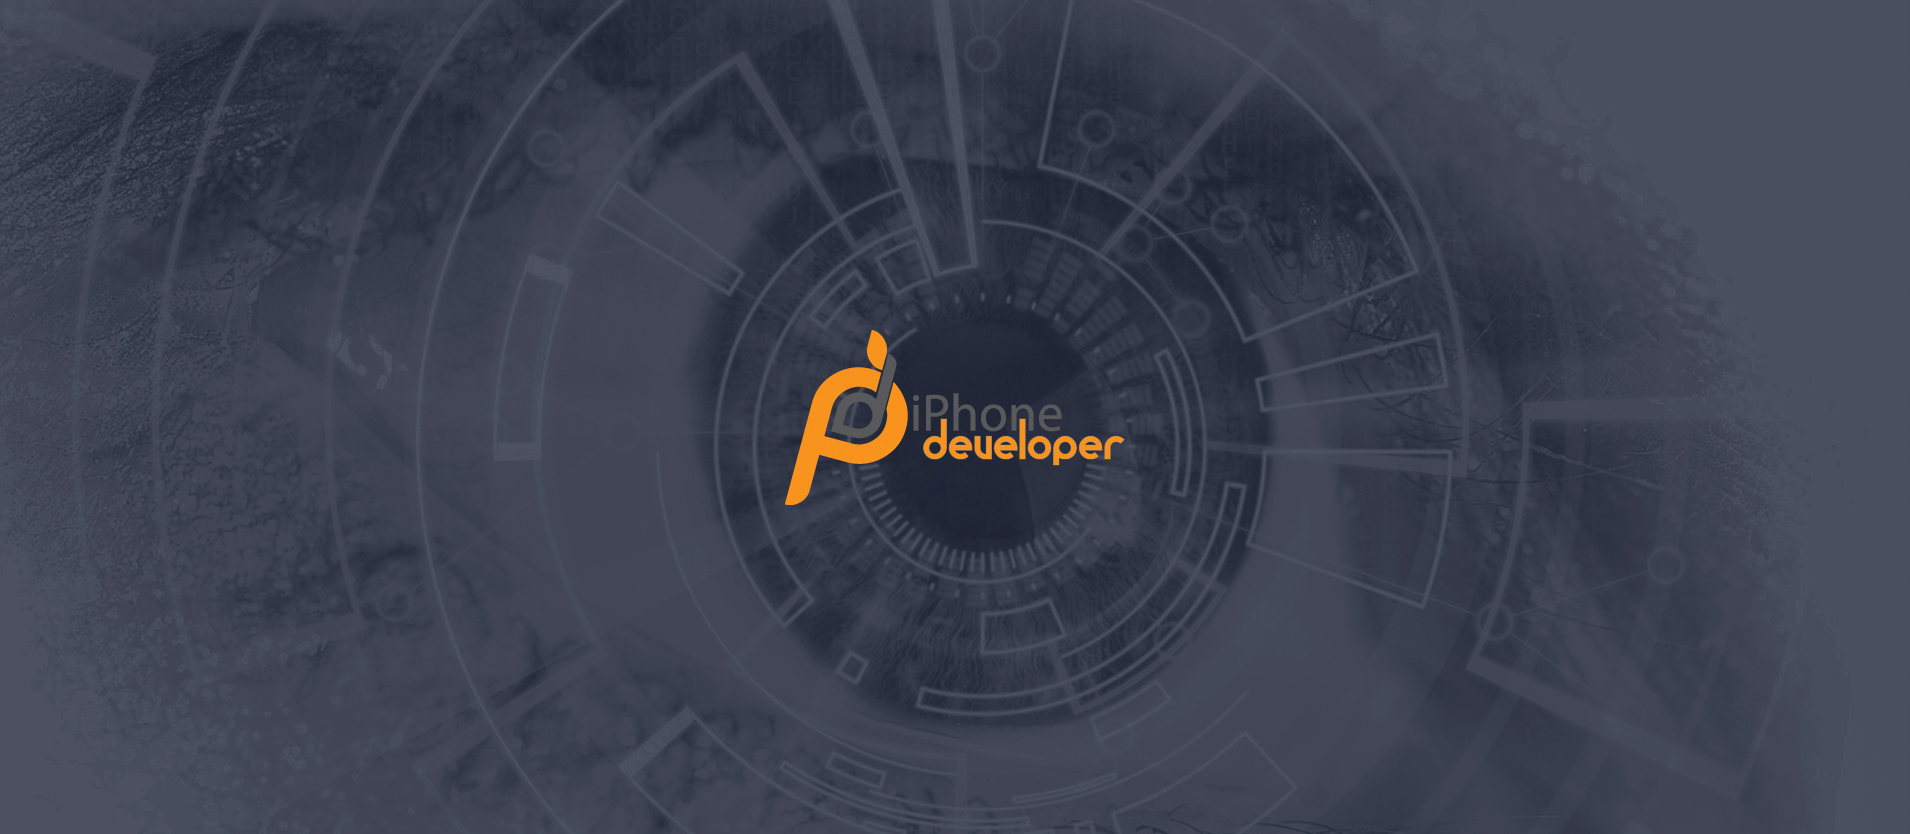 Eye Tracking  Tecnologie Applicate | iPhone Developer